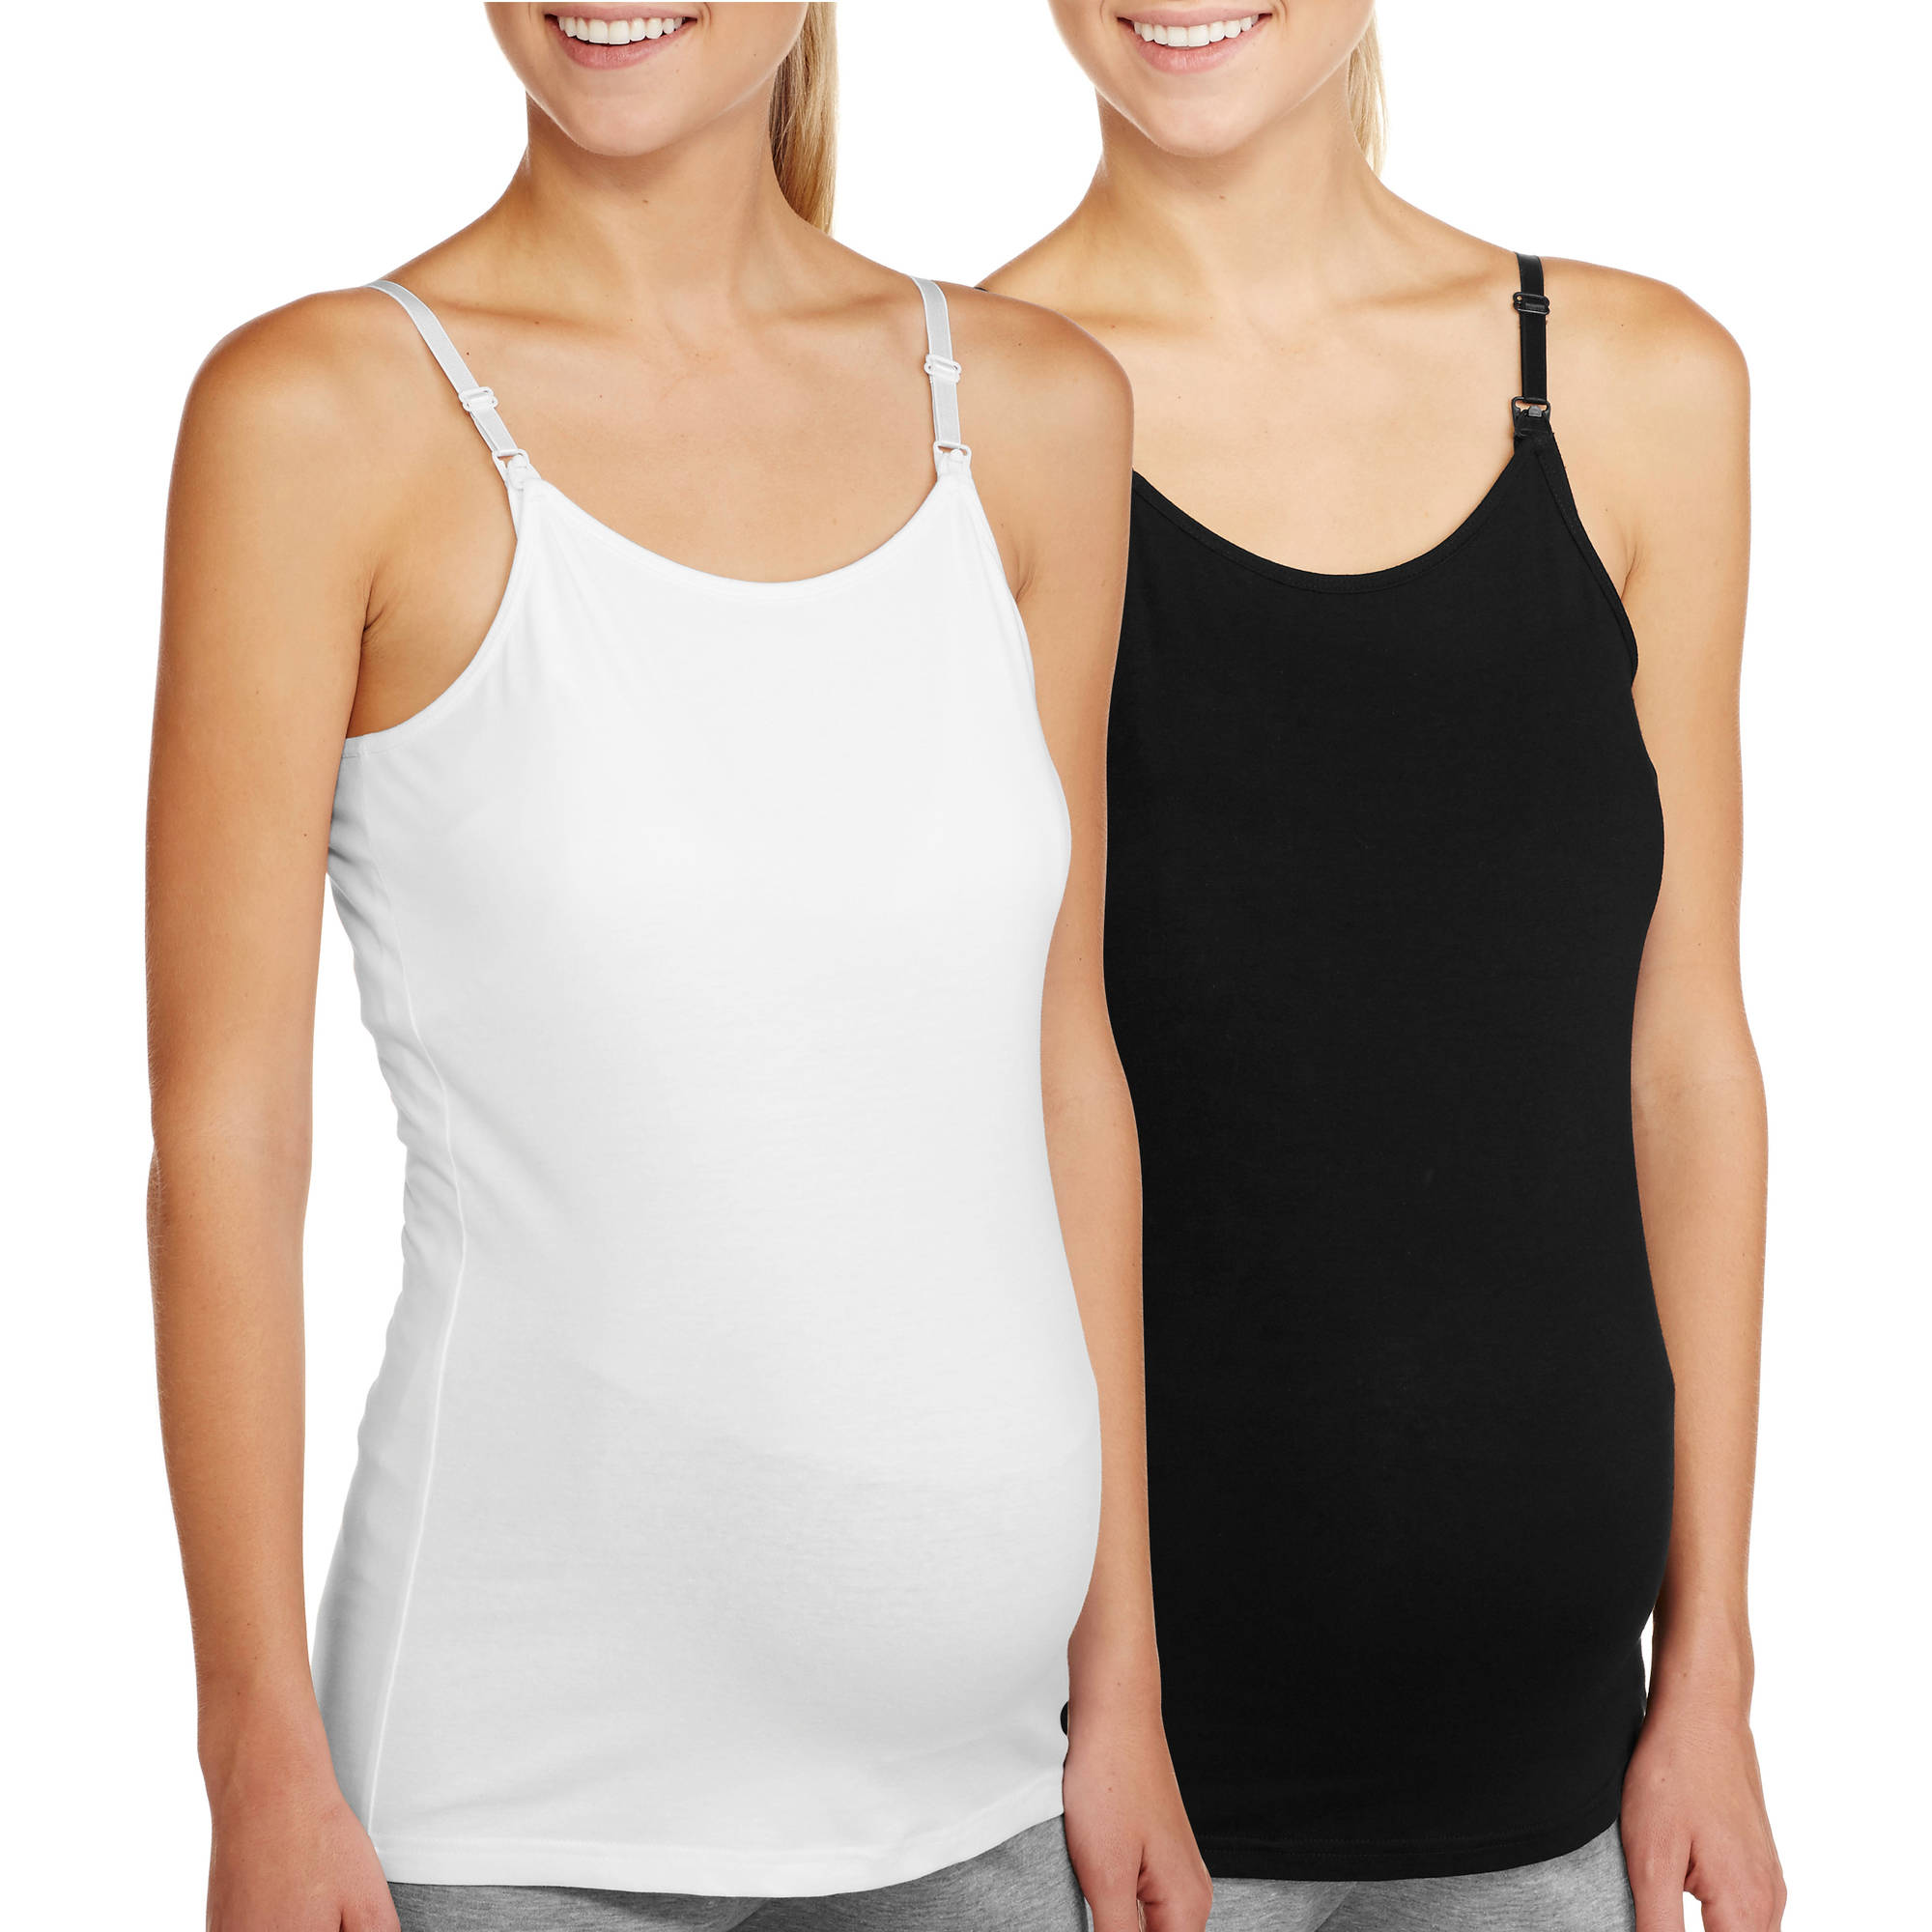 Maternity Basic Nursing Cami with Adjustable Straps, 2-Pack Value Bundle